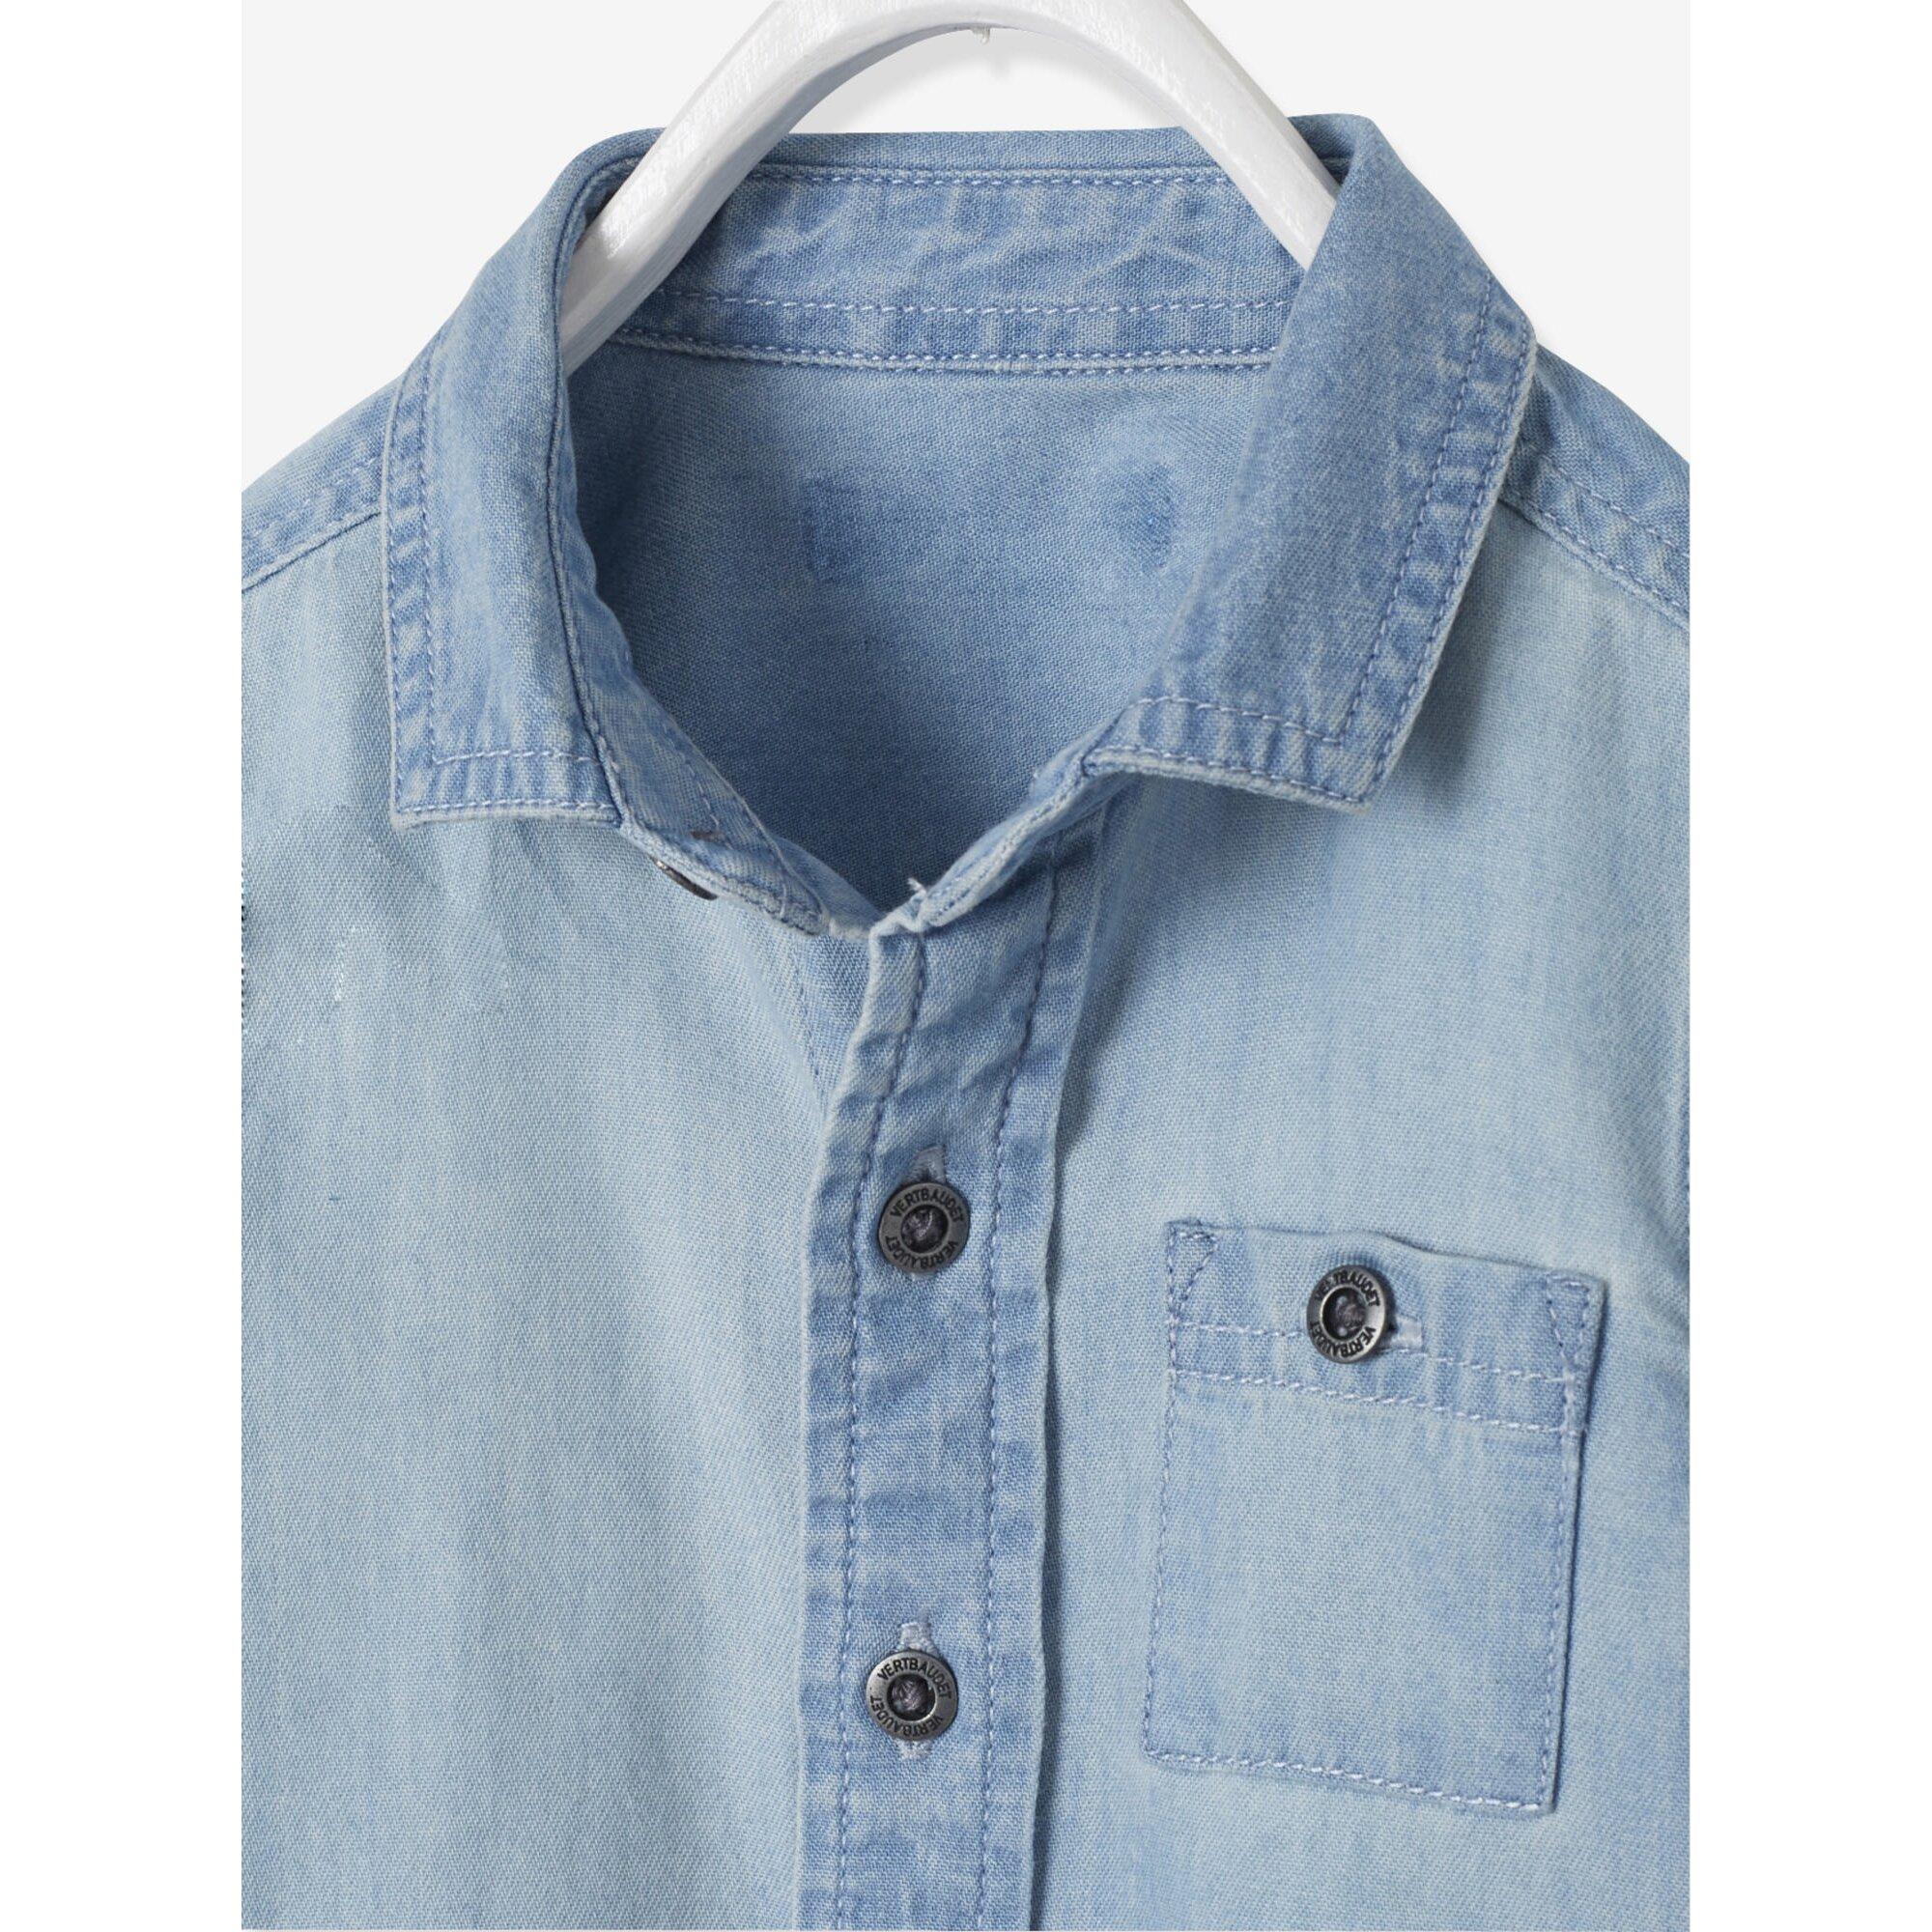 vertbaudet-jeanshemd-fur-baby-jungen-bleached